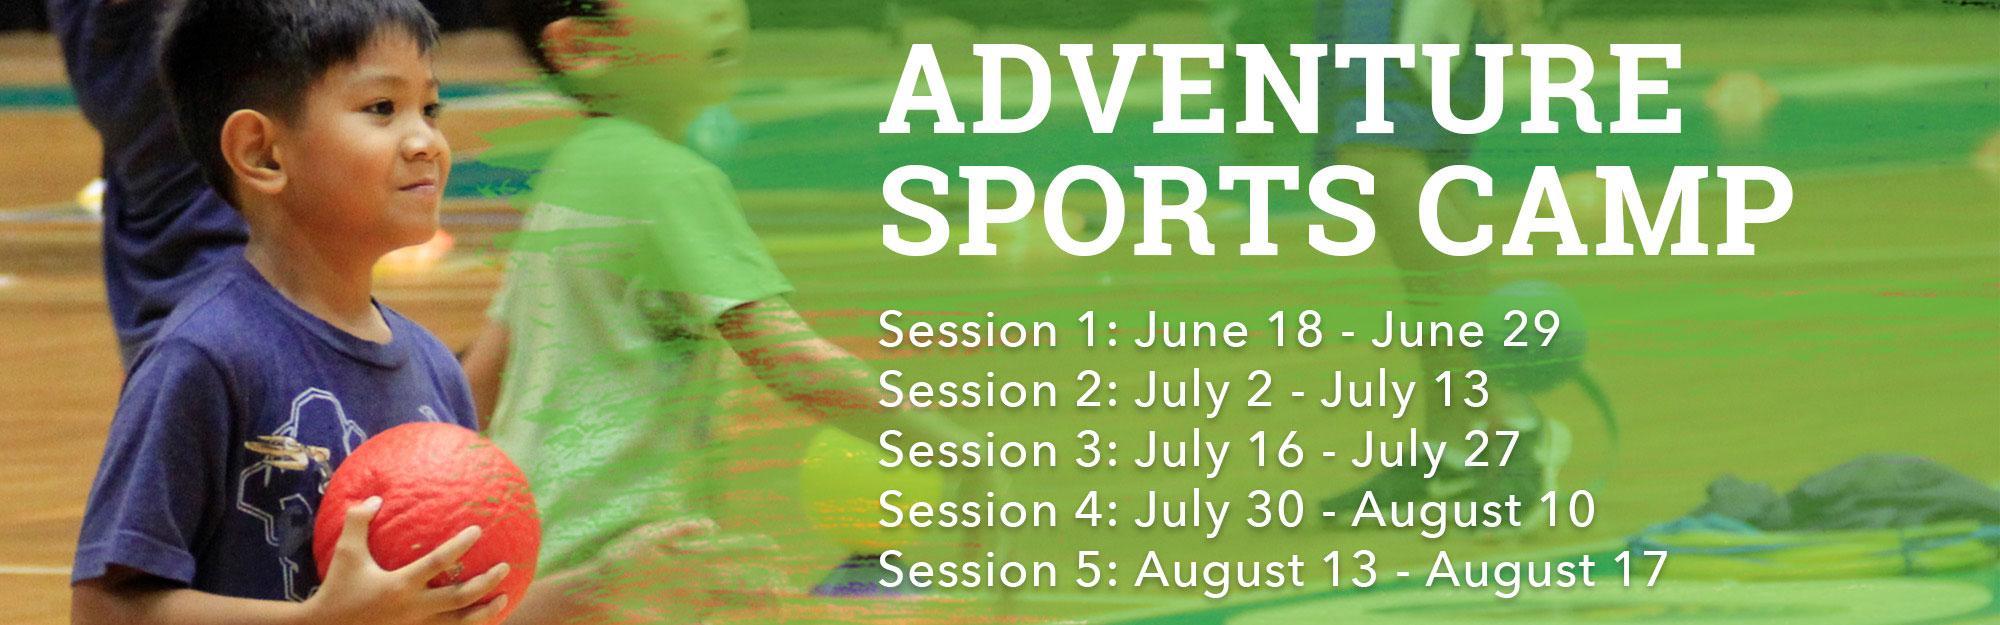 2018 Adventure Sports Camp